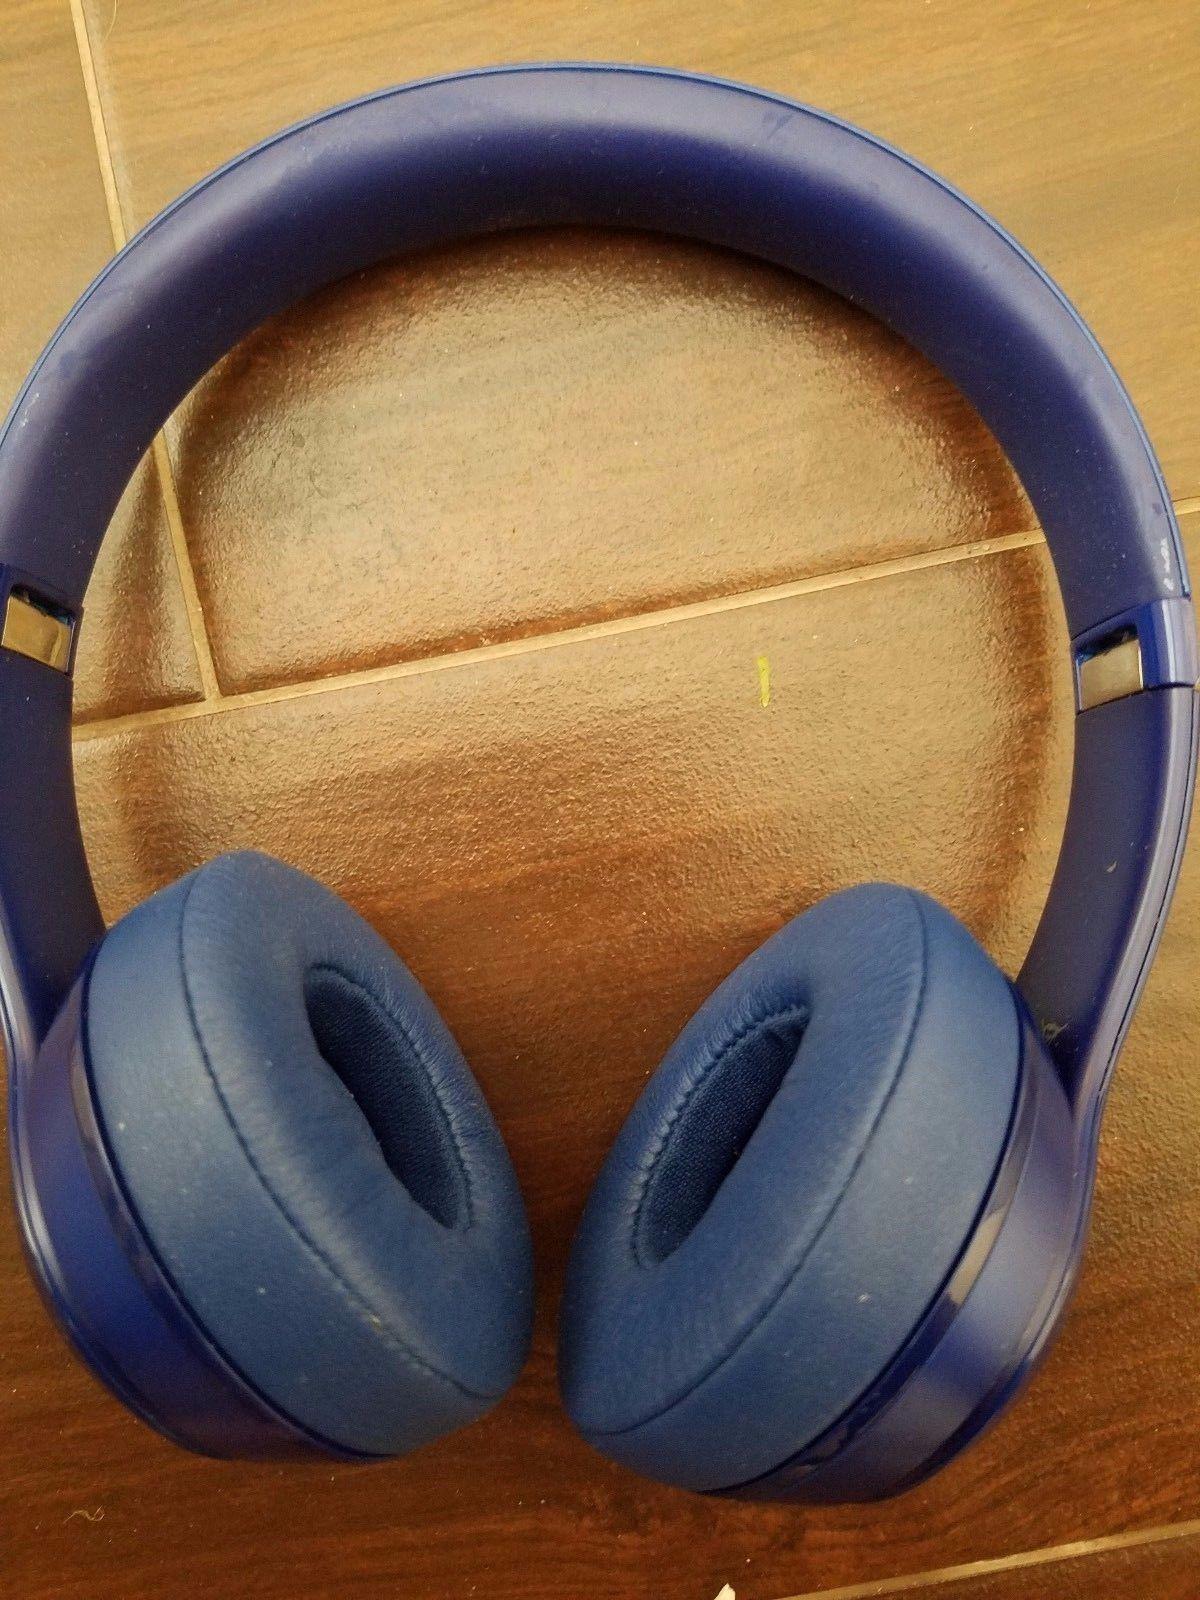 Blue Beats Solo2 Wired On-Ear Dr Dre Headphones - Works fine headphones & Cable  https://t.co/qKuZBlO5KS https://t.co/Ov8mSdtWGm